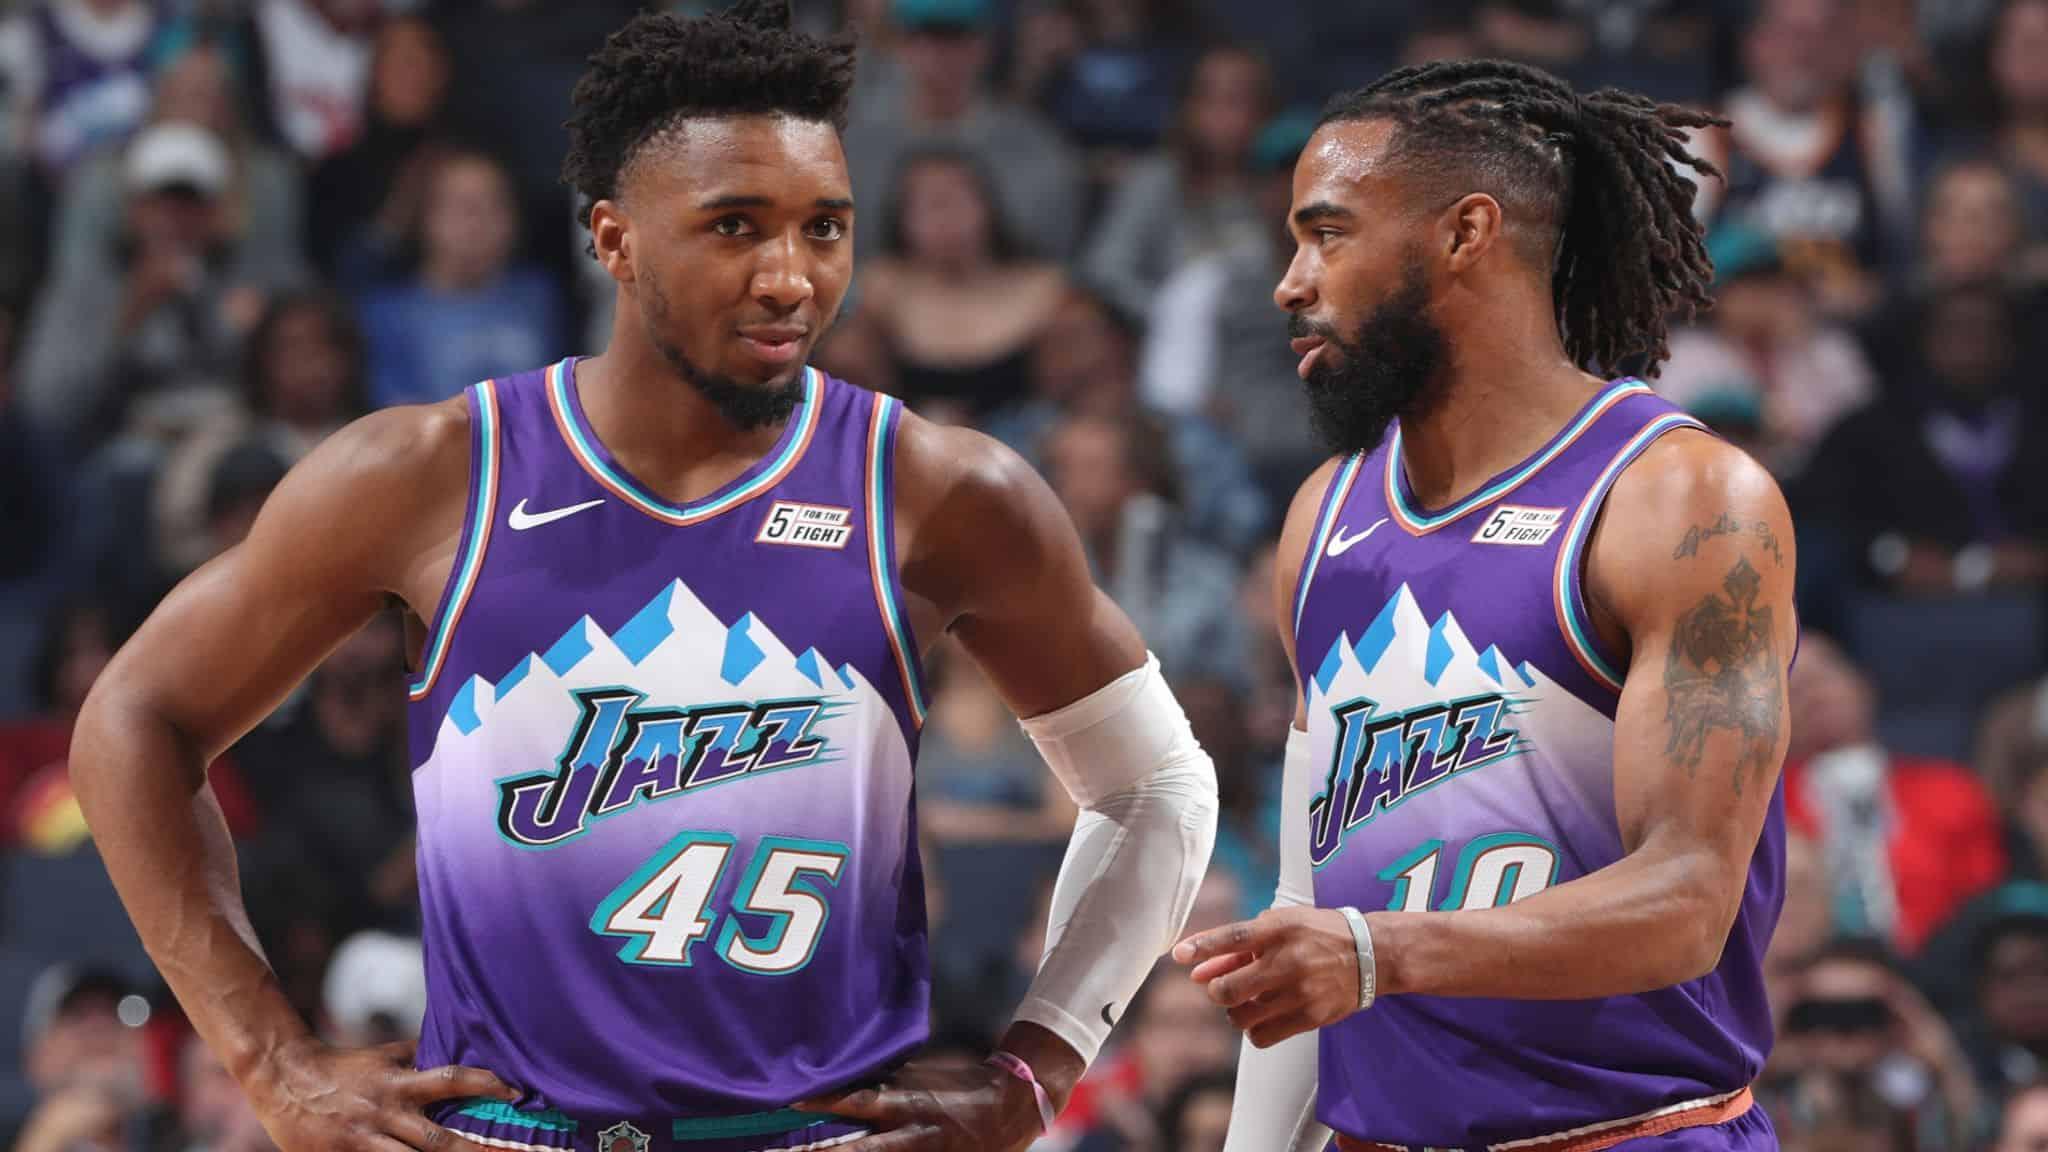 BasketballNcaa - Utah Jazz